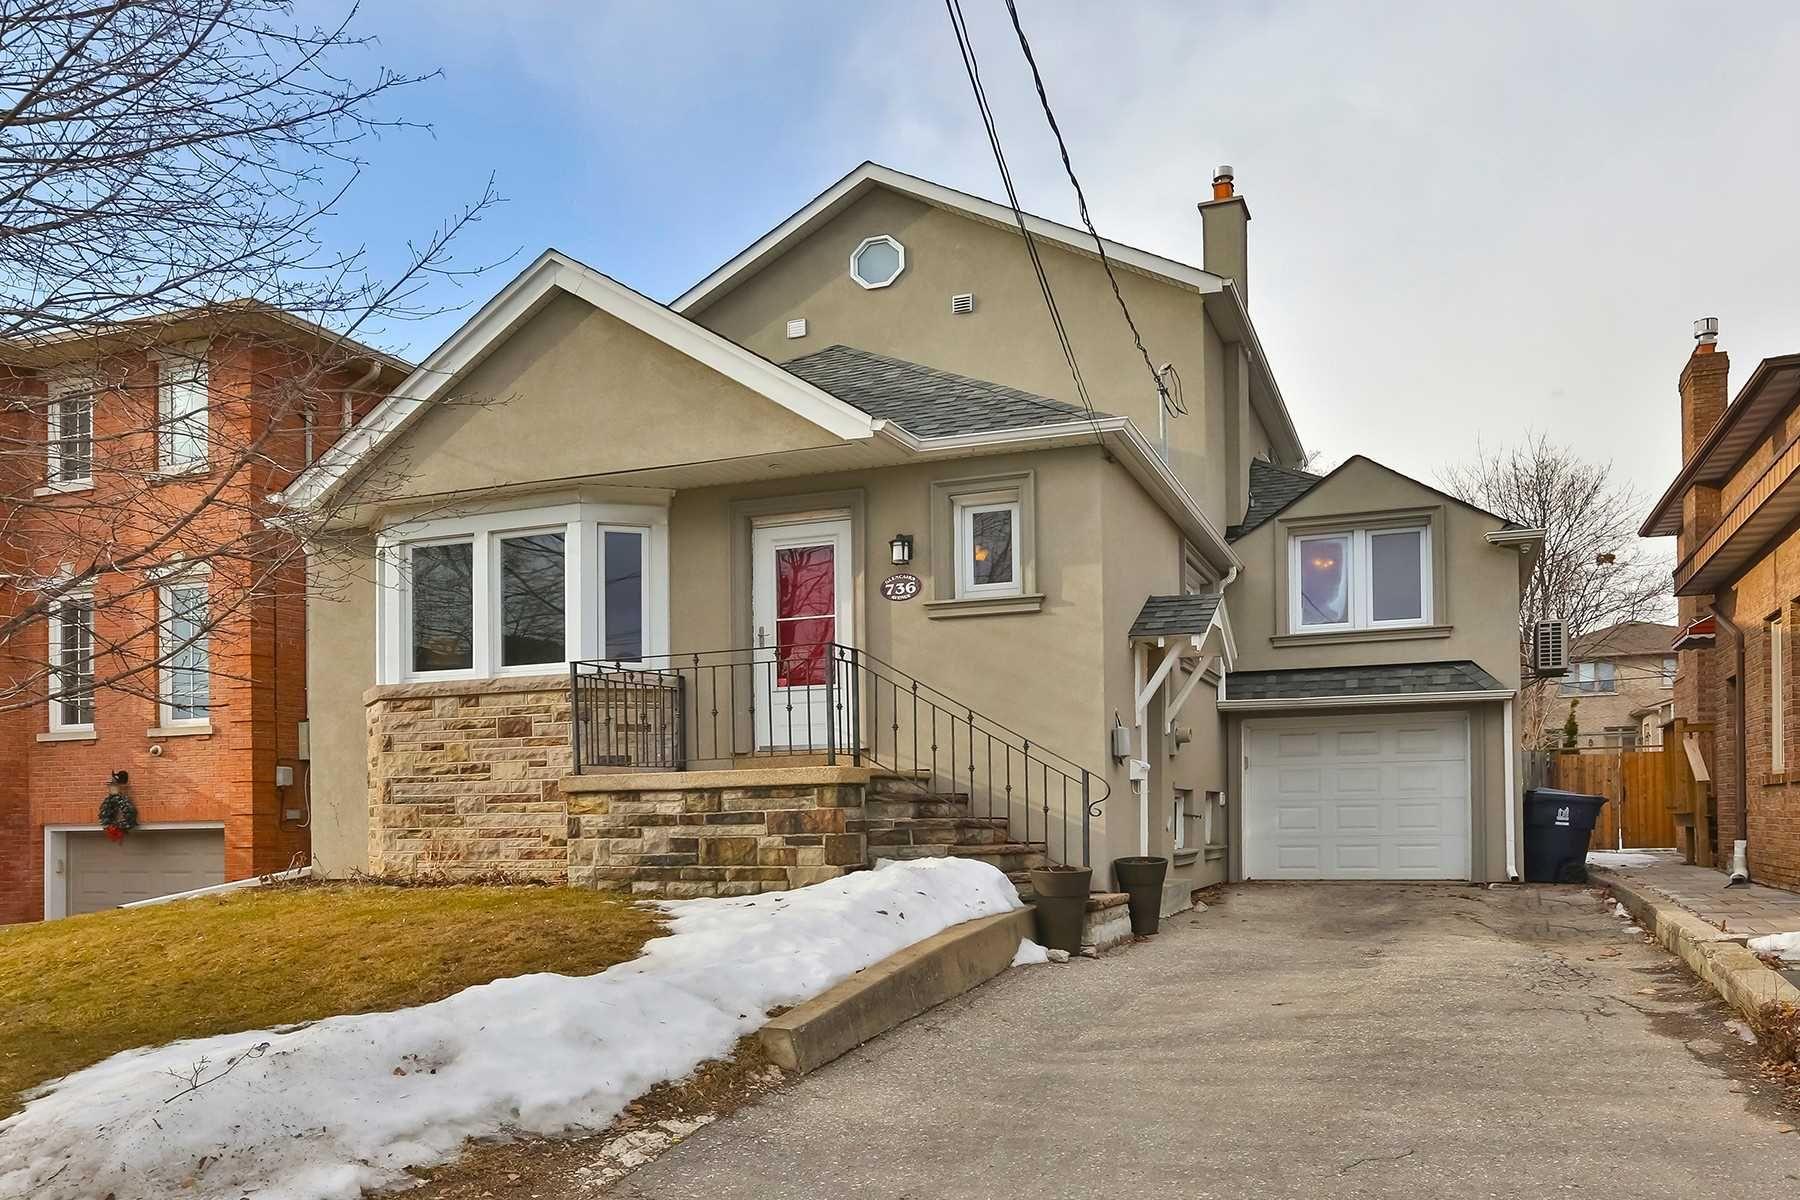 Main Photo: 736 Glencairn Avenue in Toronto: Englemount-Lawrence House (1 1/2 Storey) for sale (Toronto C04)  : MLS®# C5133912